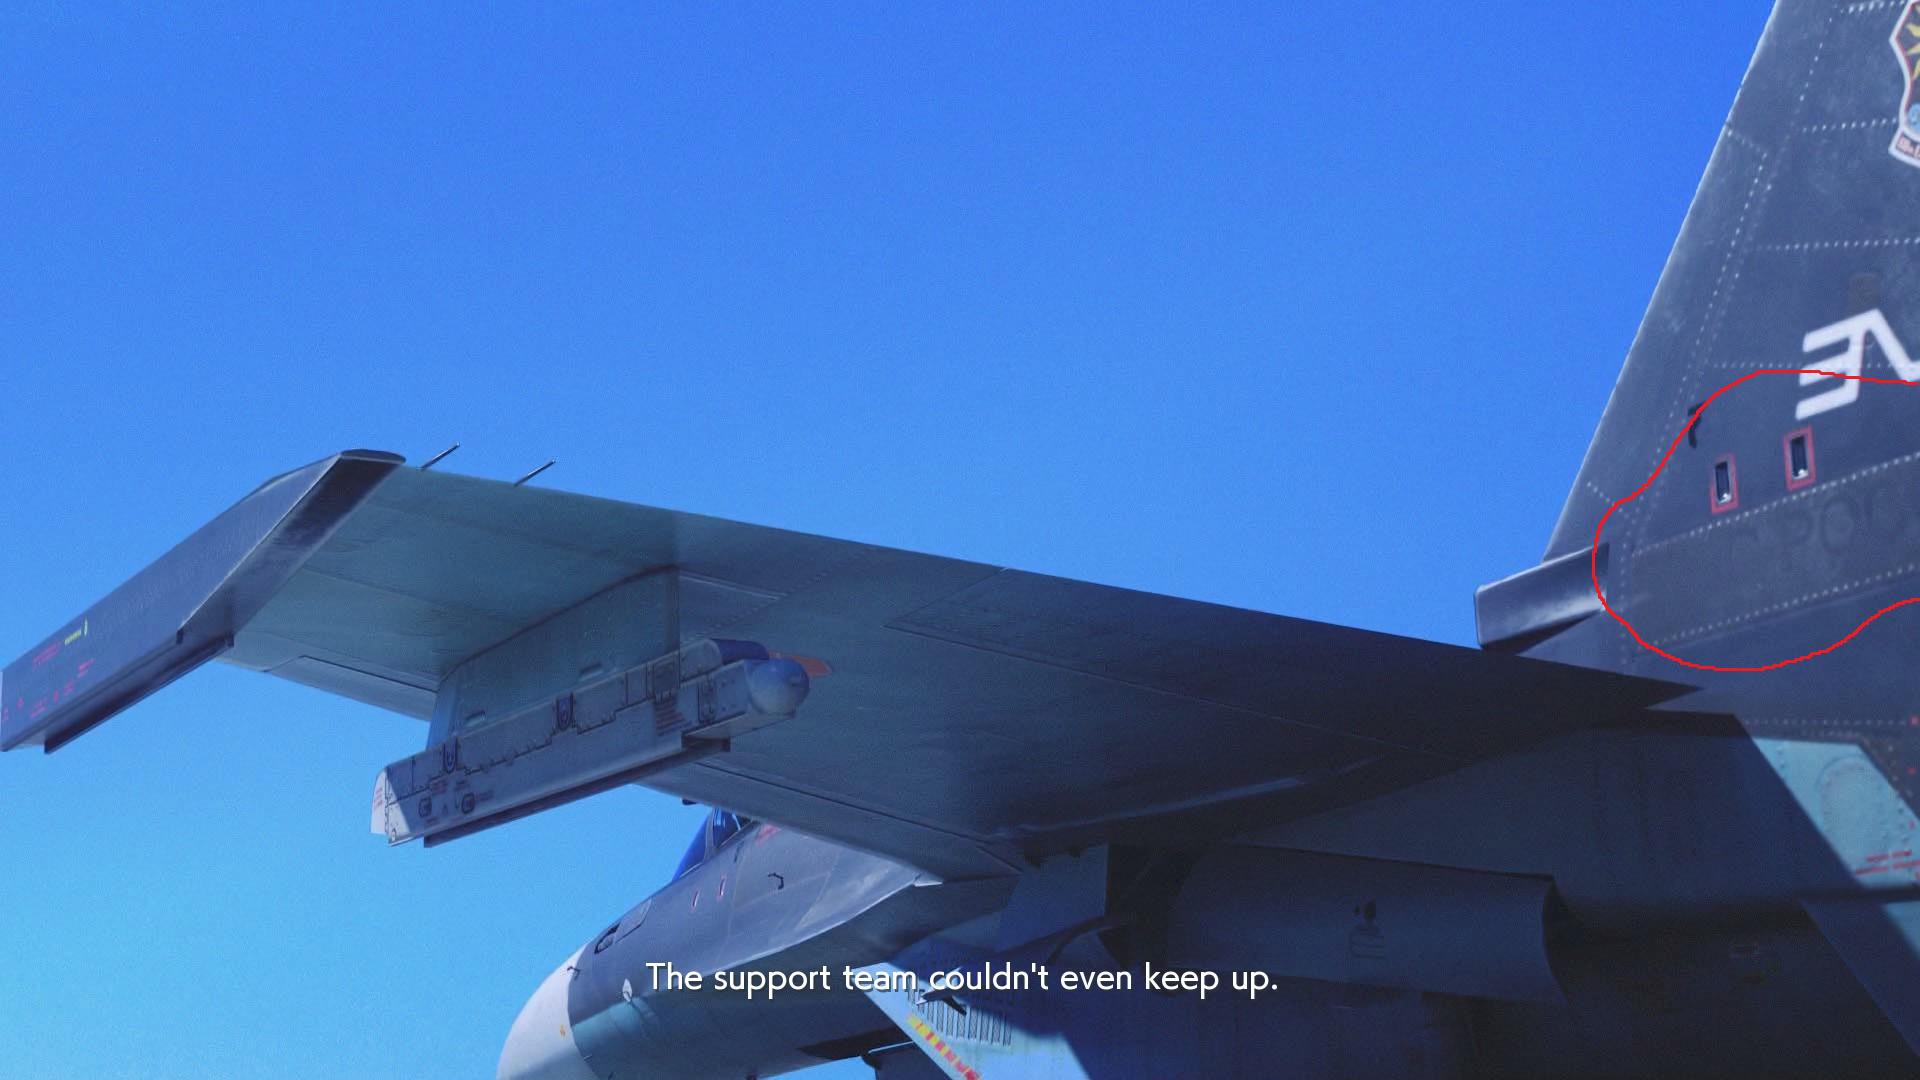 Very faint ВВС РОССИИ seen on Sol Squadron Su-30M2